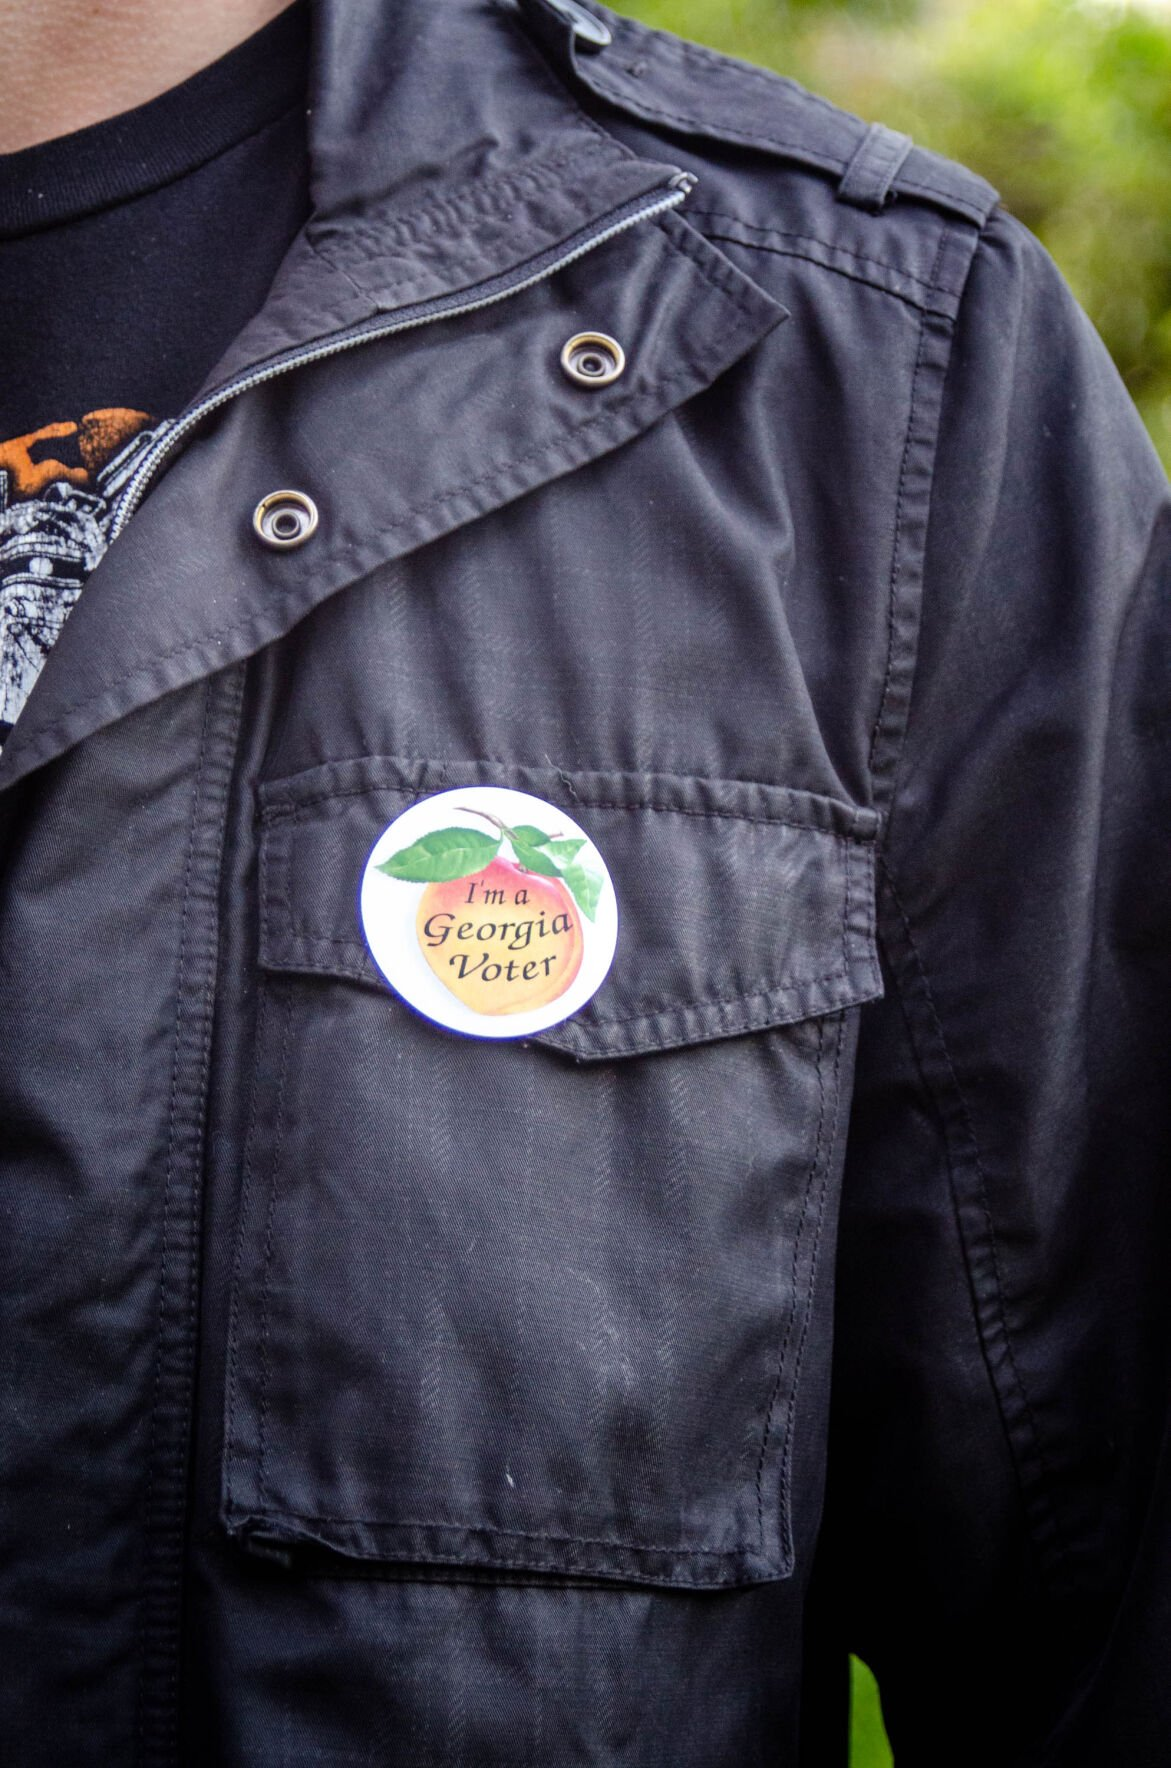 Georgia Voter 2